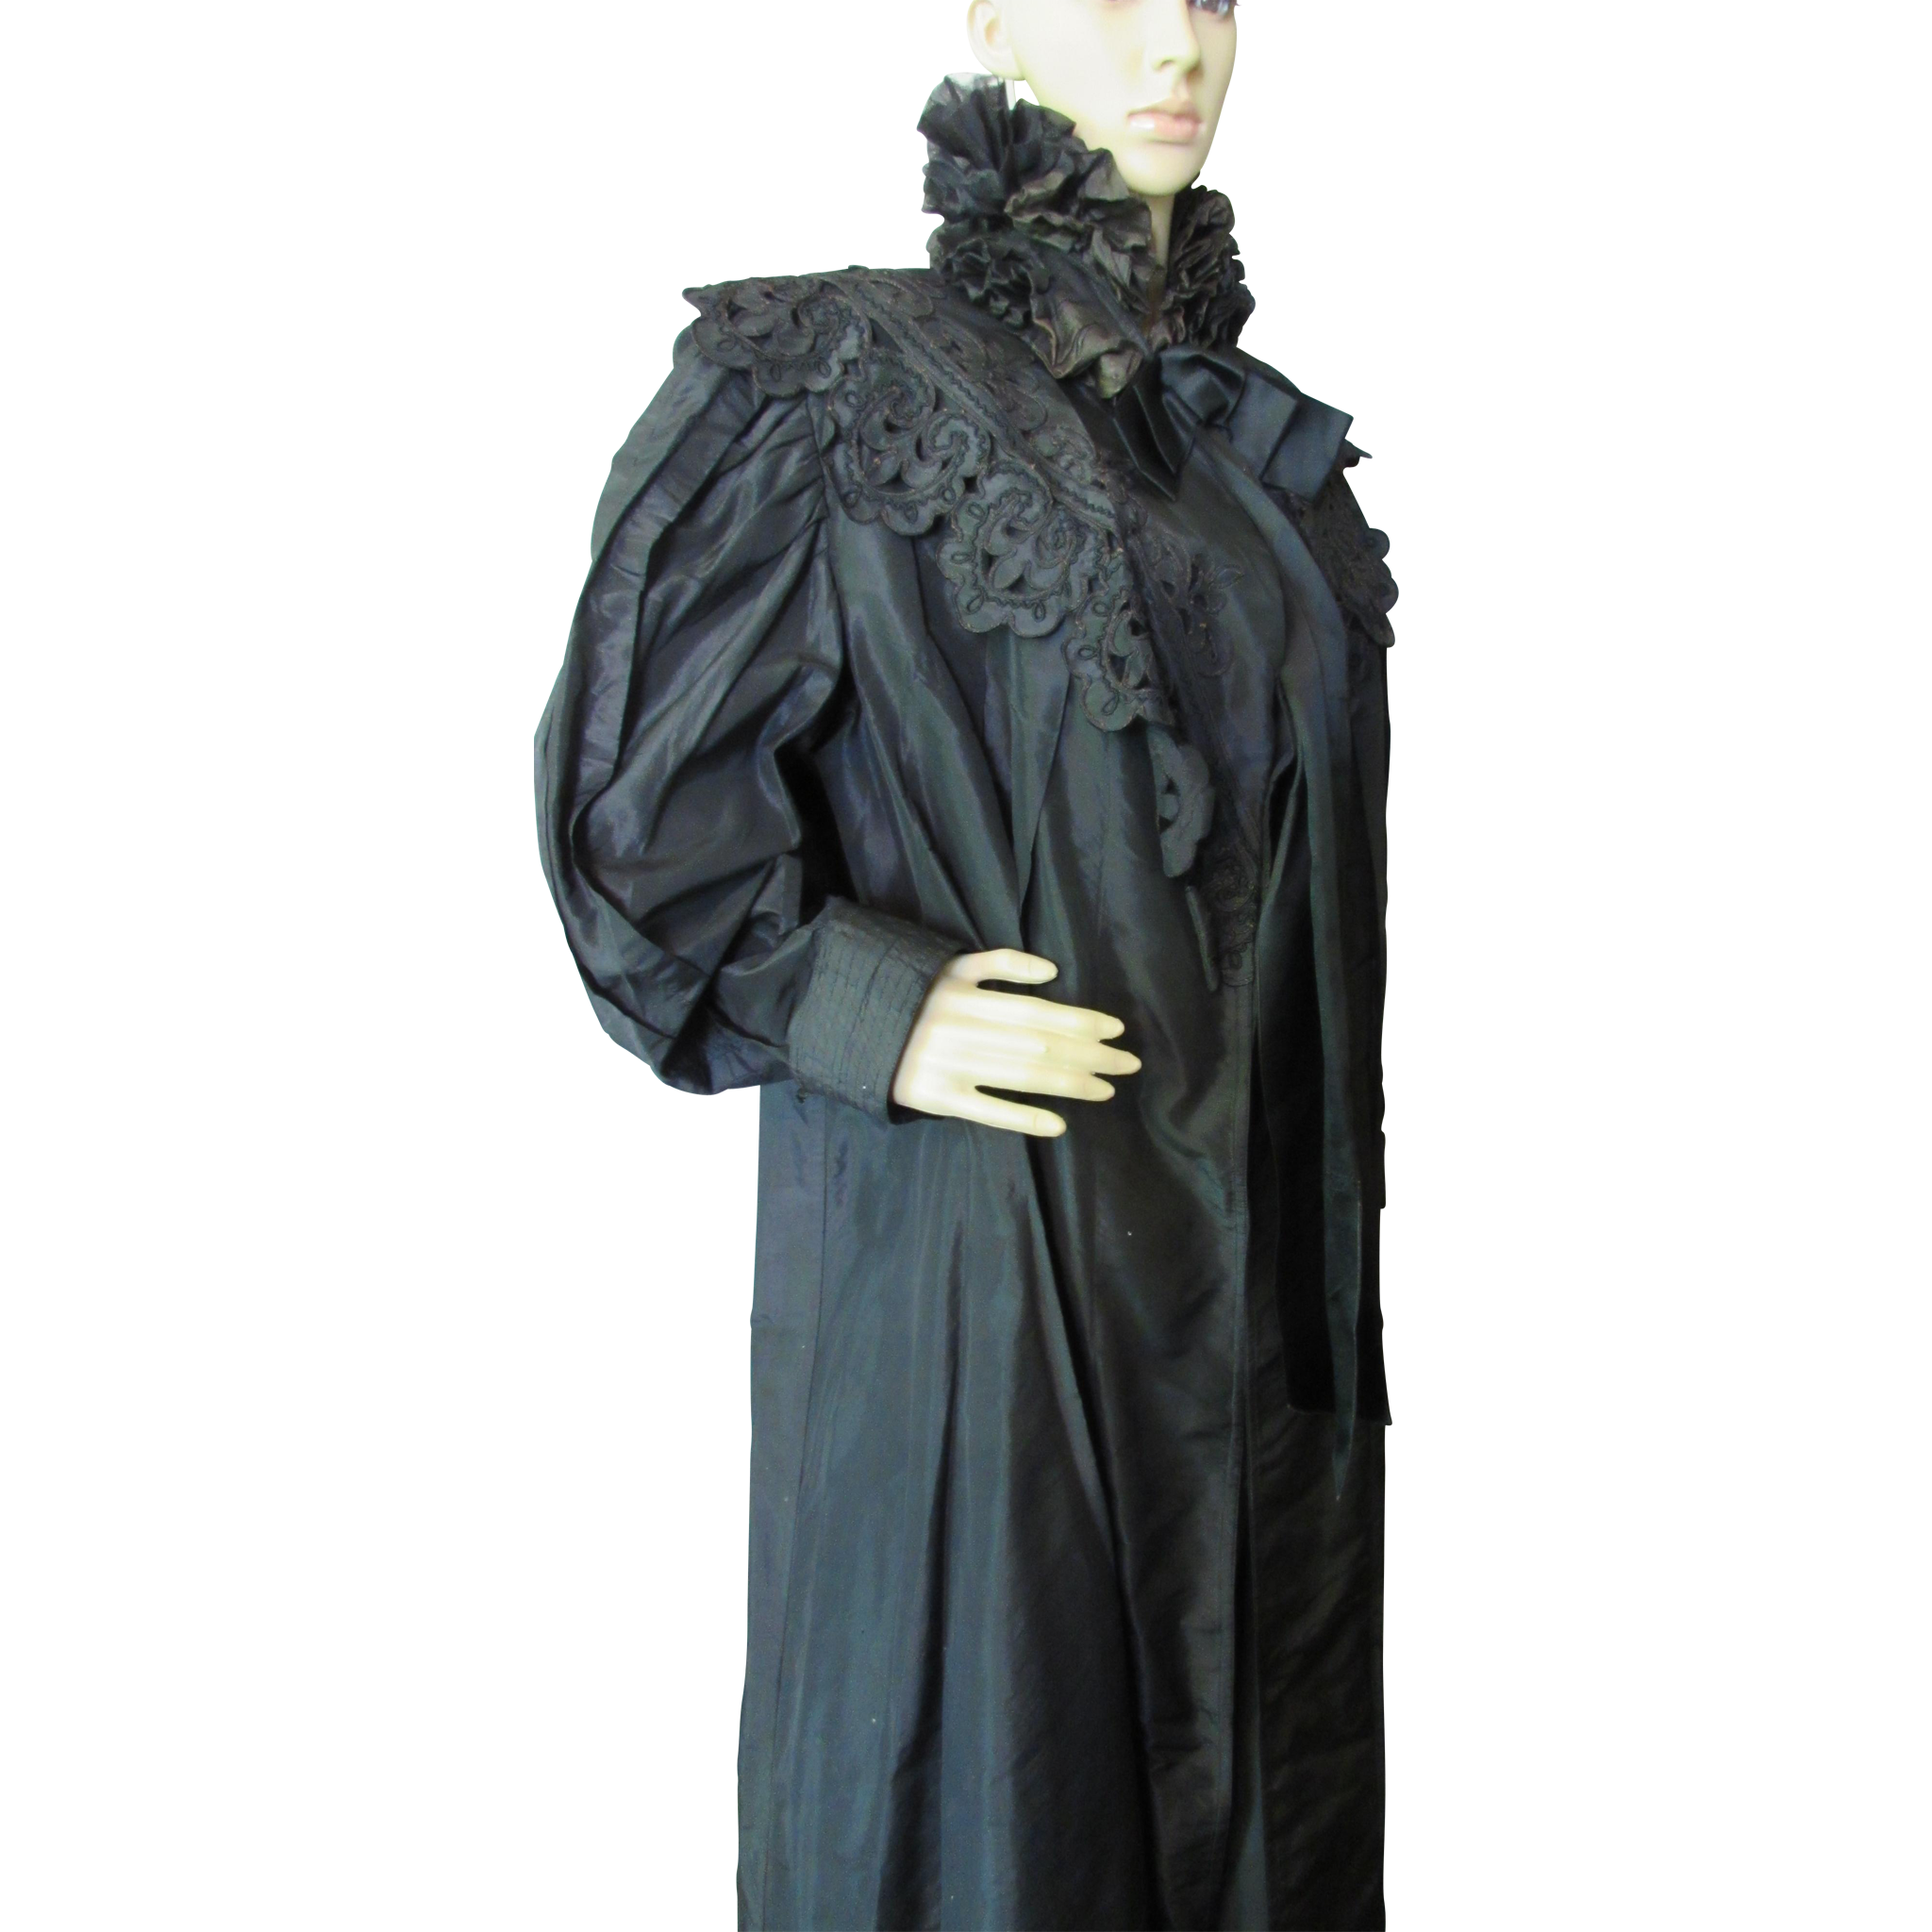 Victorian Era Black Mourning Wrapper with Ruffled Muffler 1890-1910